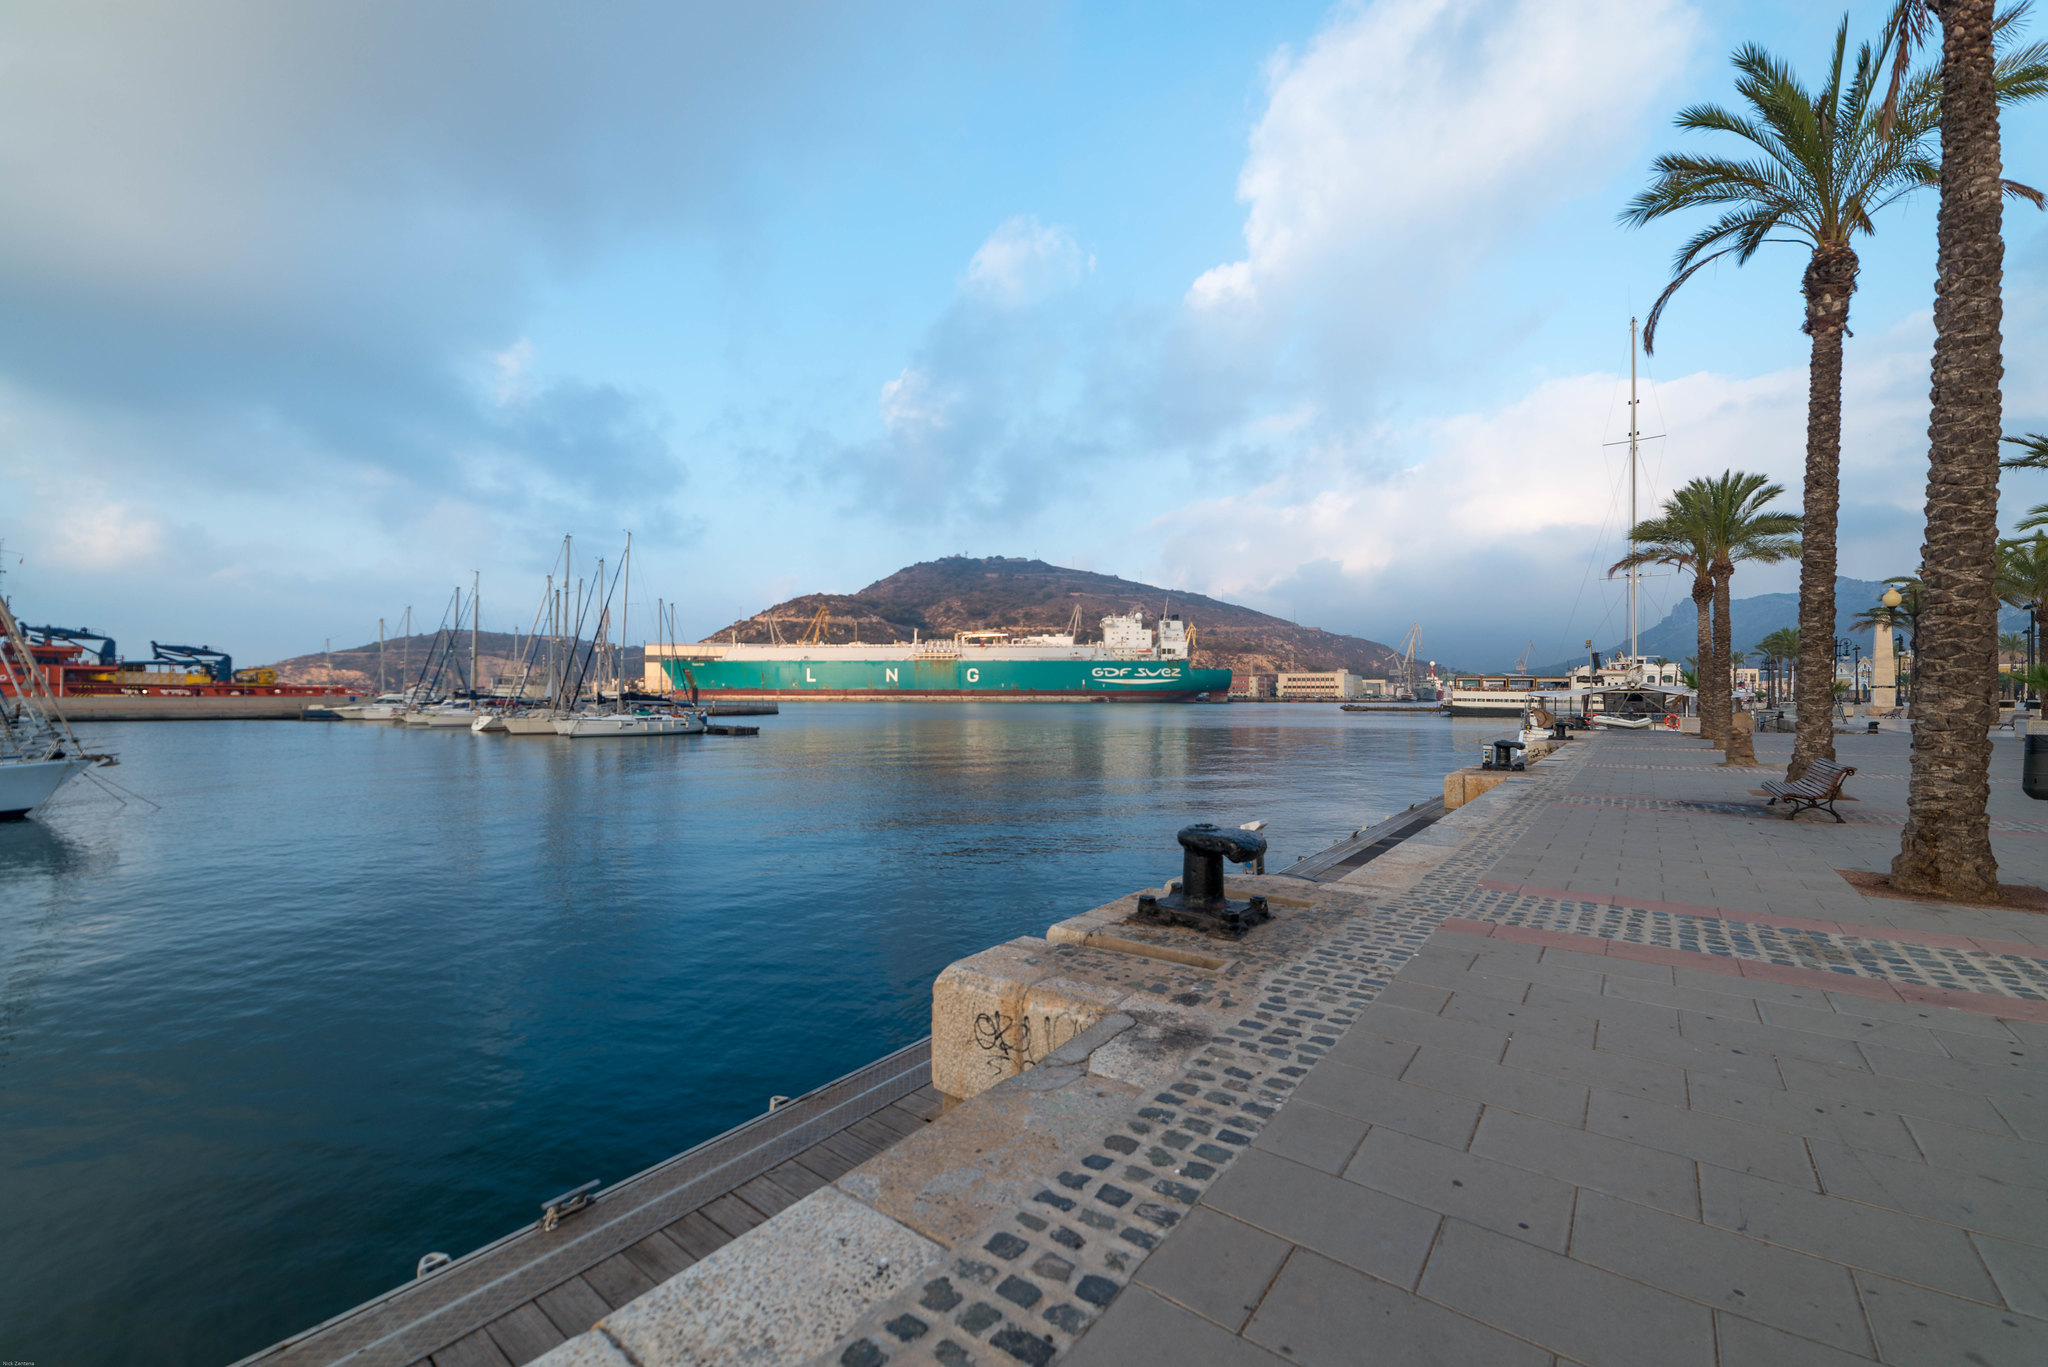 Cartagena Spain harbour